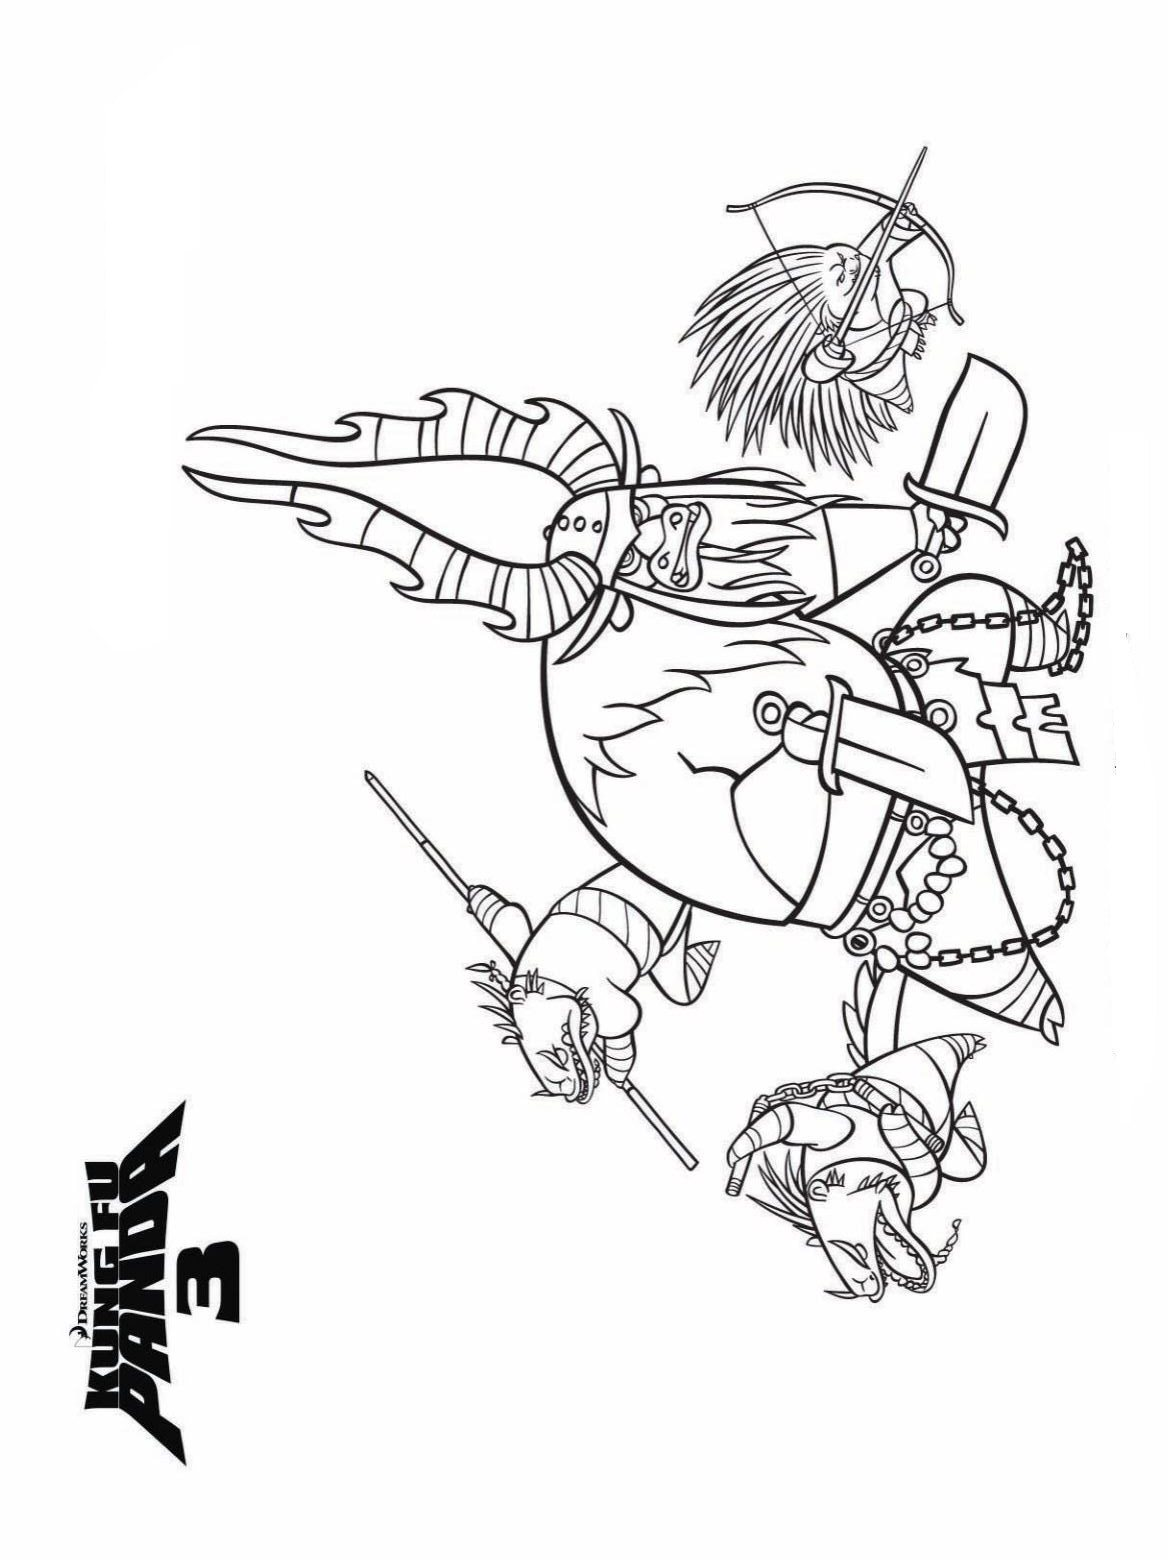 n 7 coloring pages of kung fu panda 3